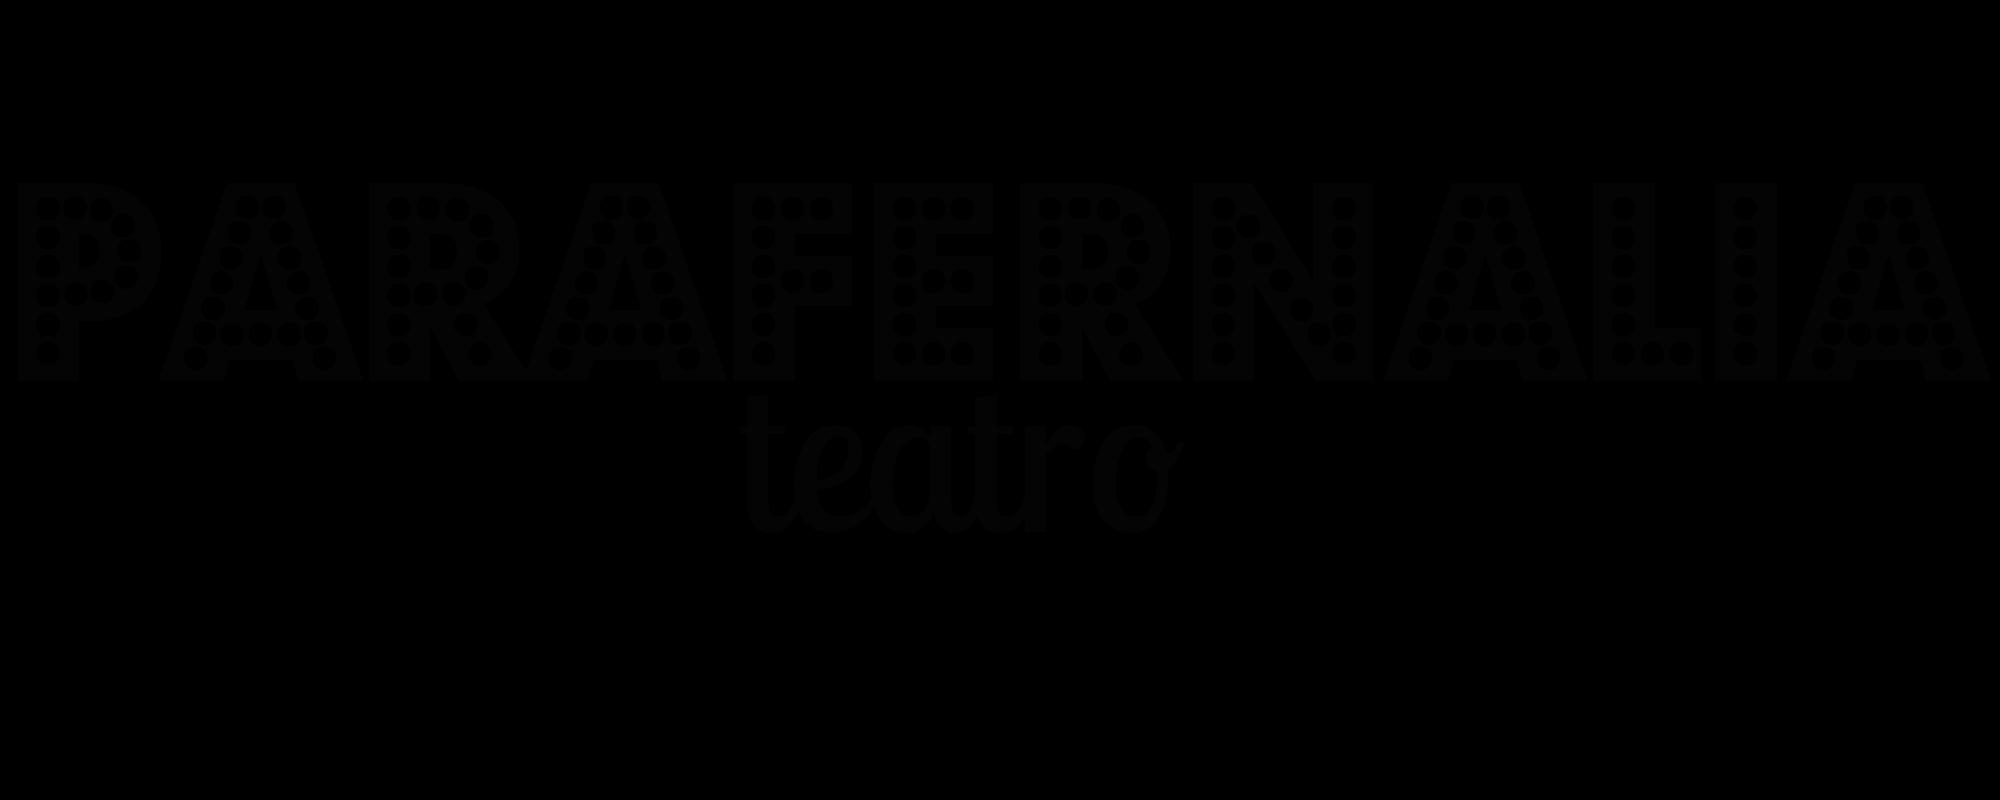 LogoParaf sin fondo letras negras